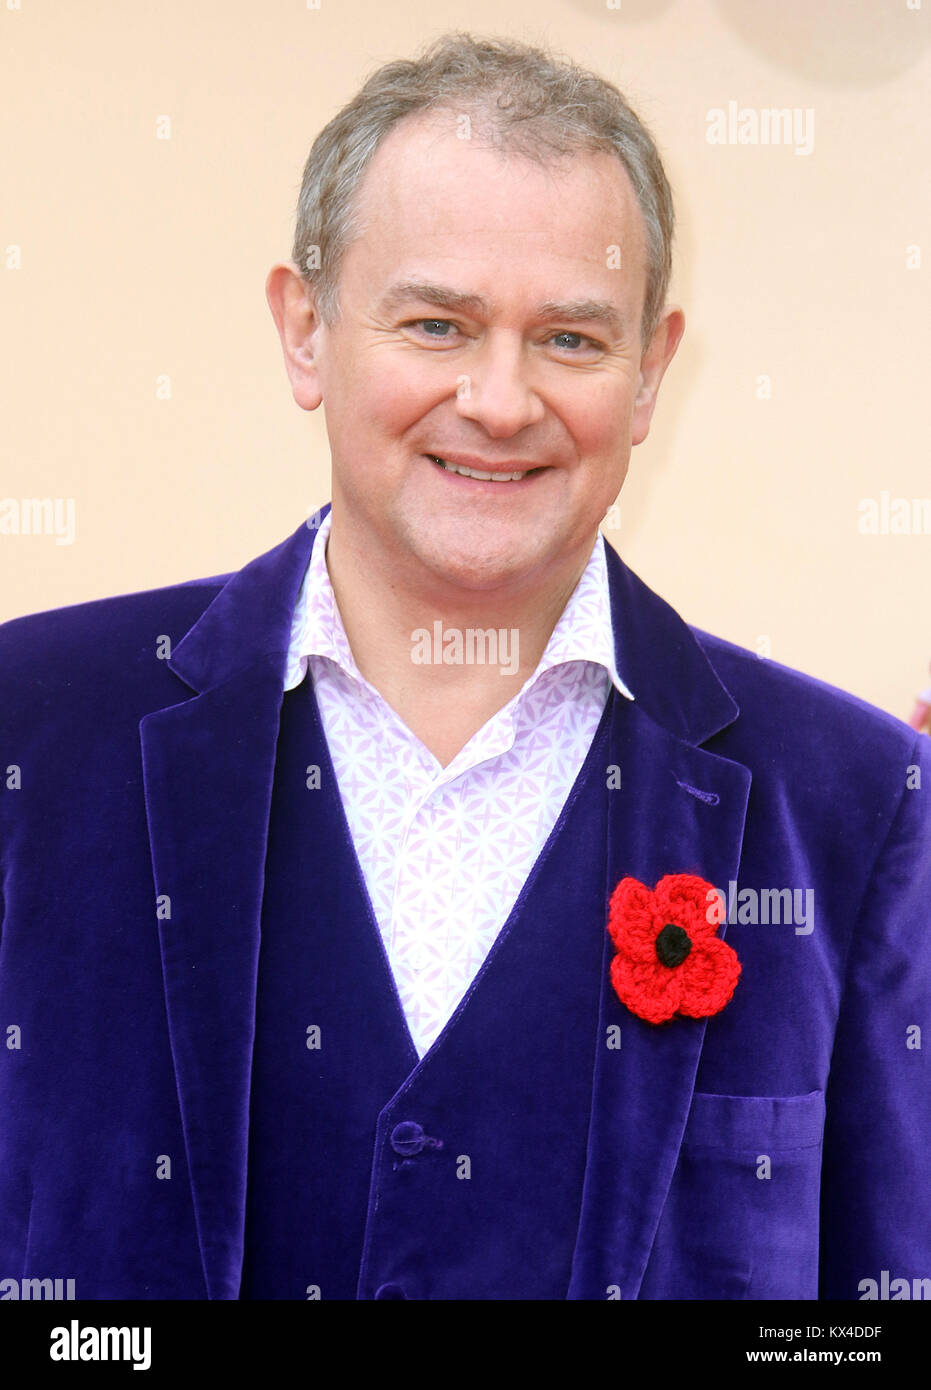 Nov 05, 2017 - Hugh Bonneville attending 'Paddington 2' World Premiere, BFI Southbank in London, England, - Stock Image